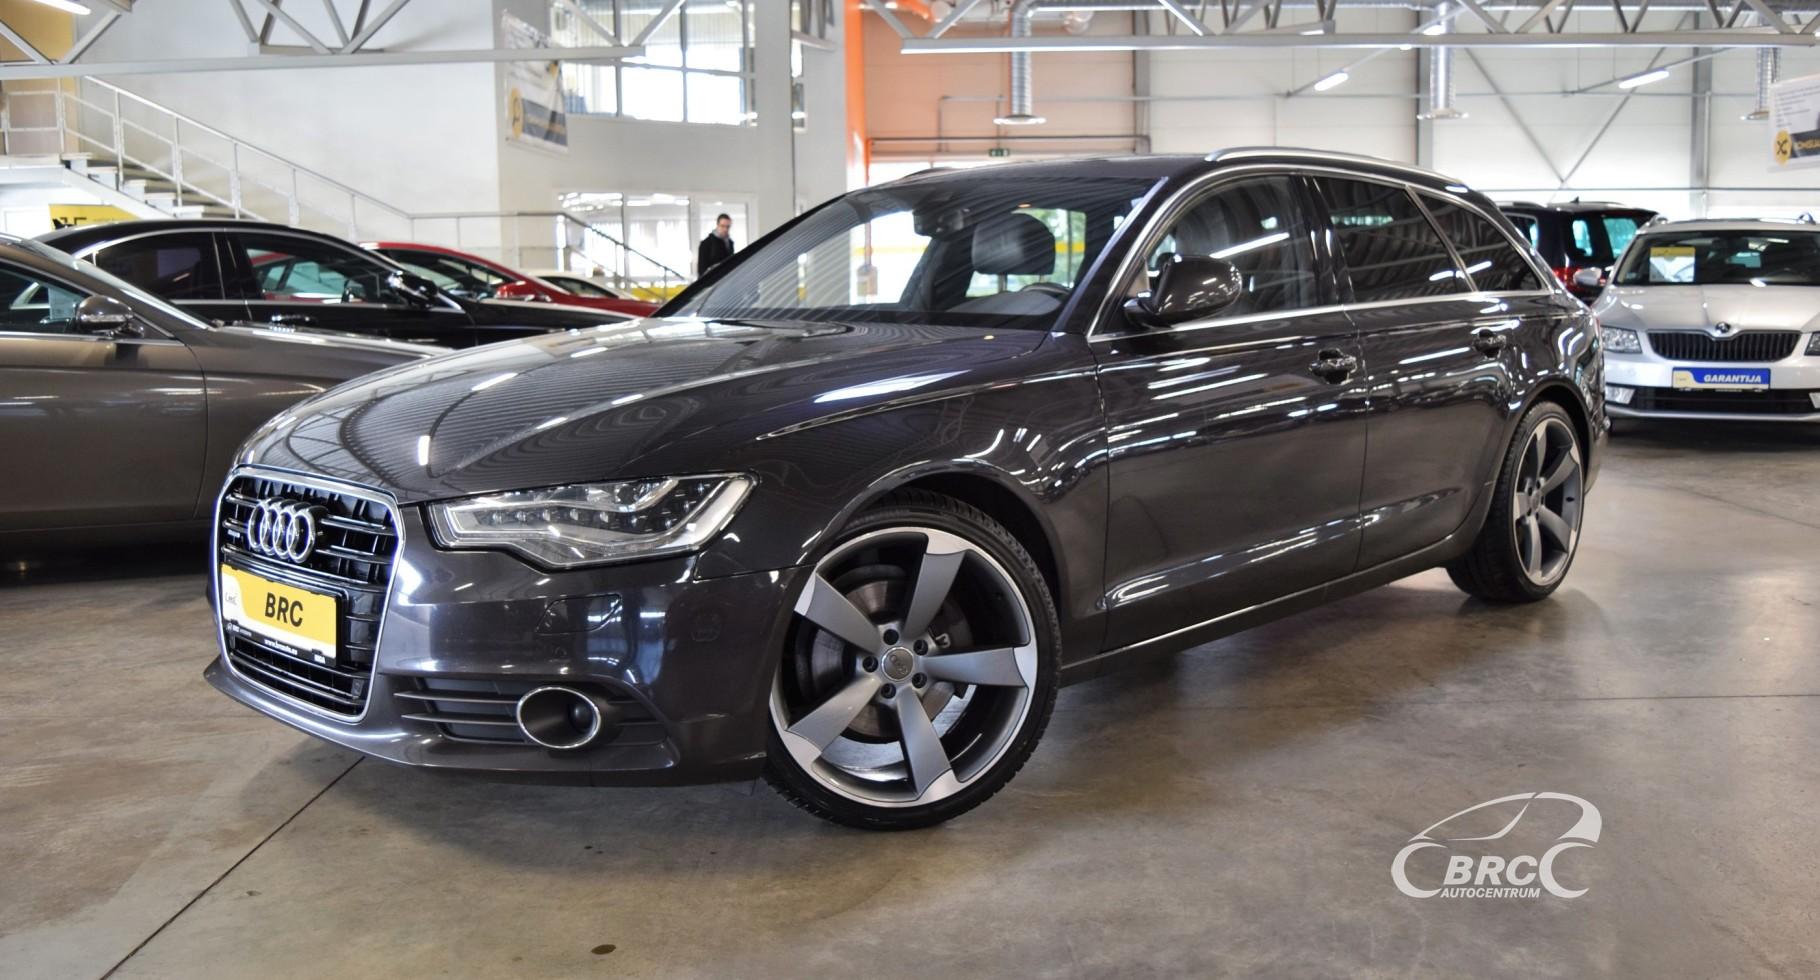 Audi A6 Avant Quattro